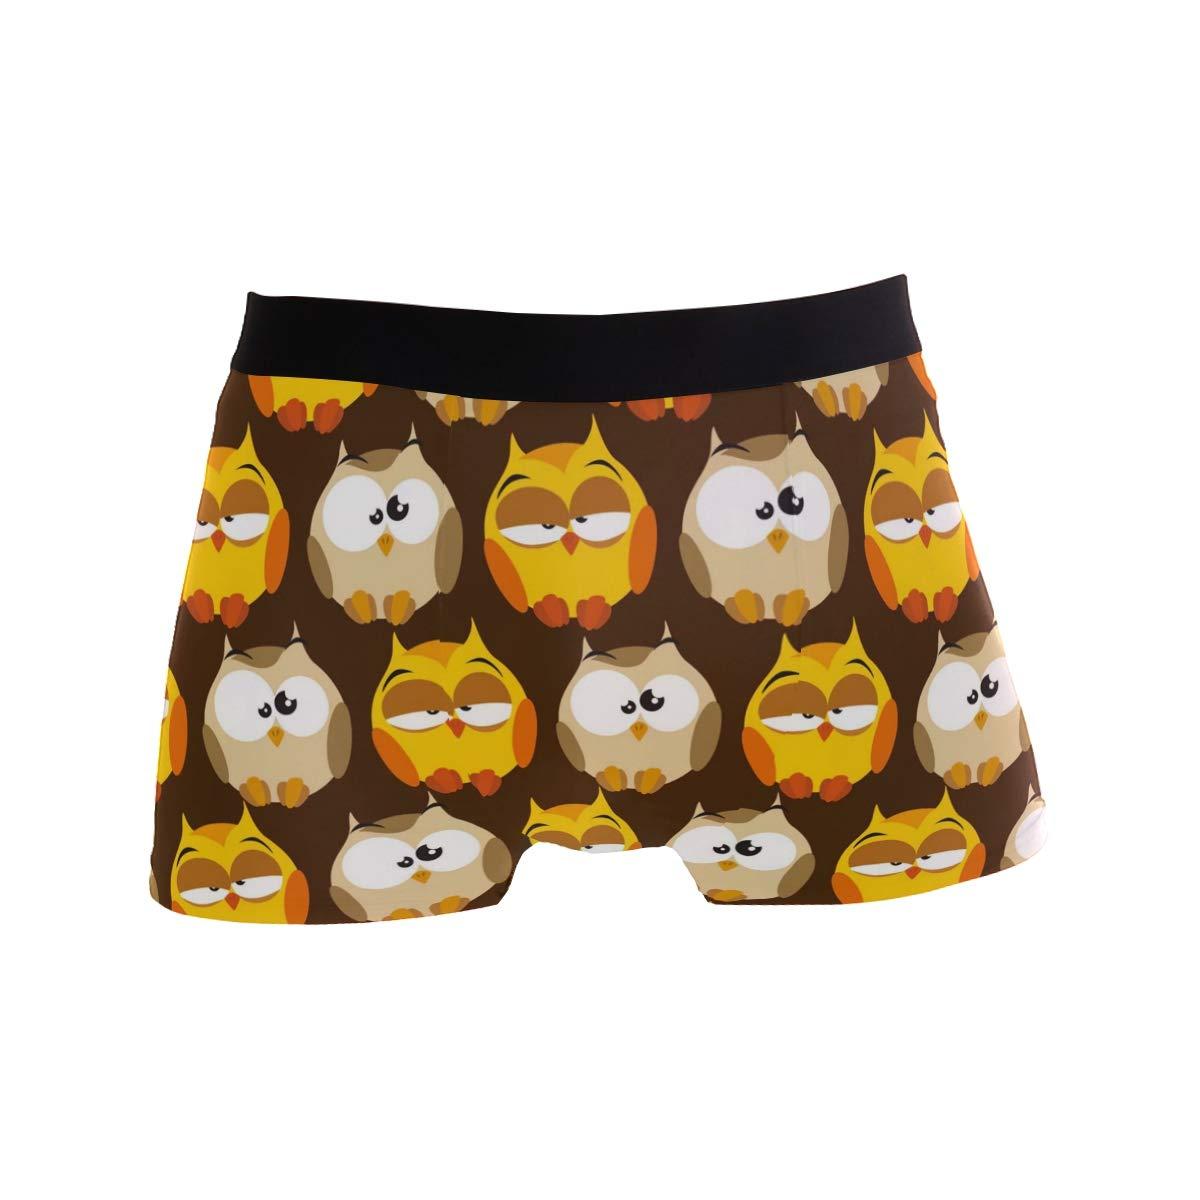 Mens Comfortable Underwear Owl Pattern Boxer Briefs for Men